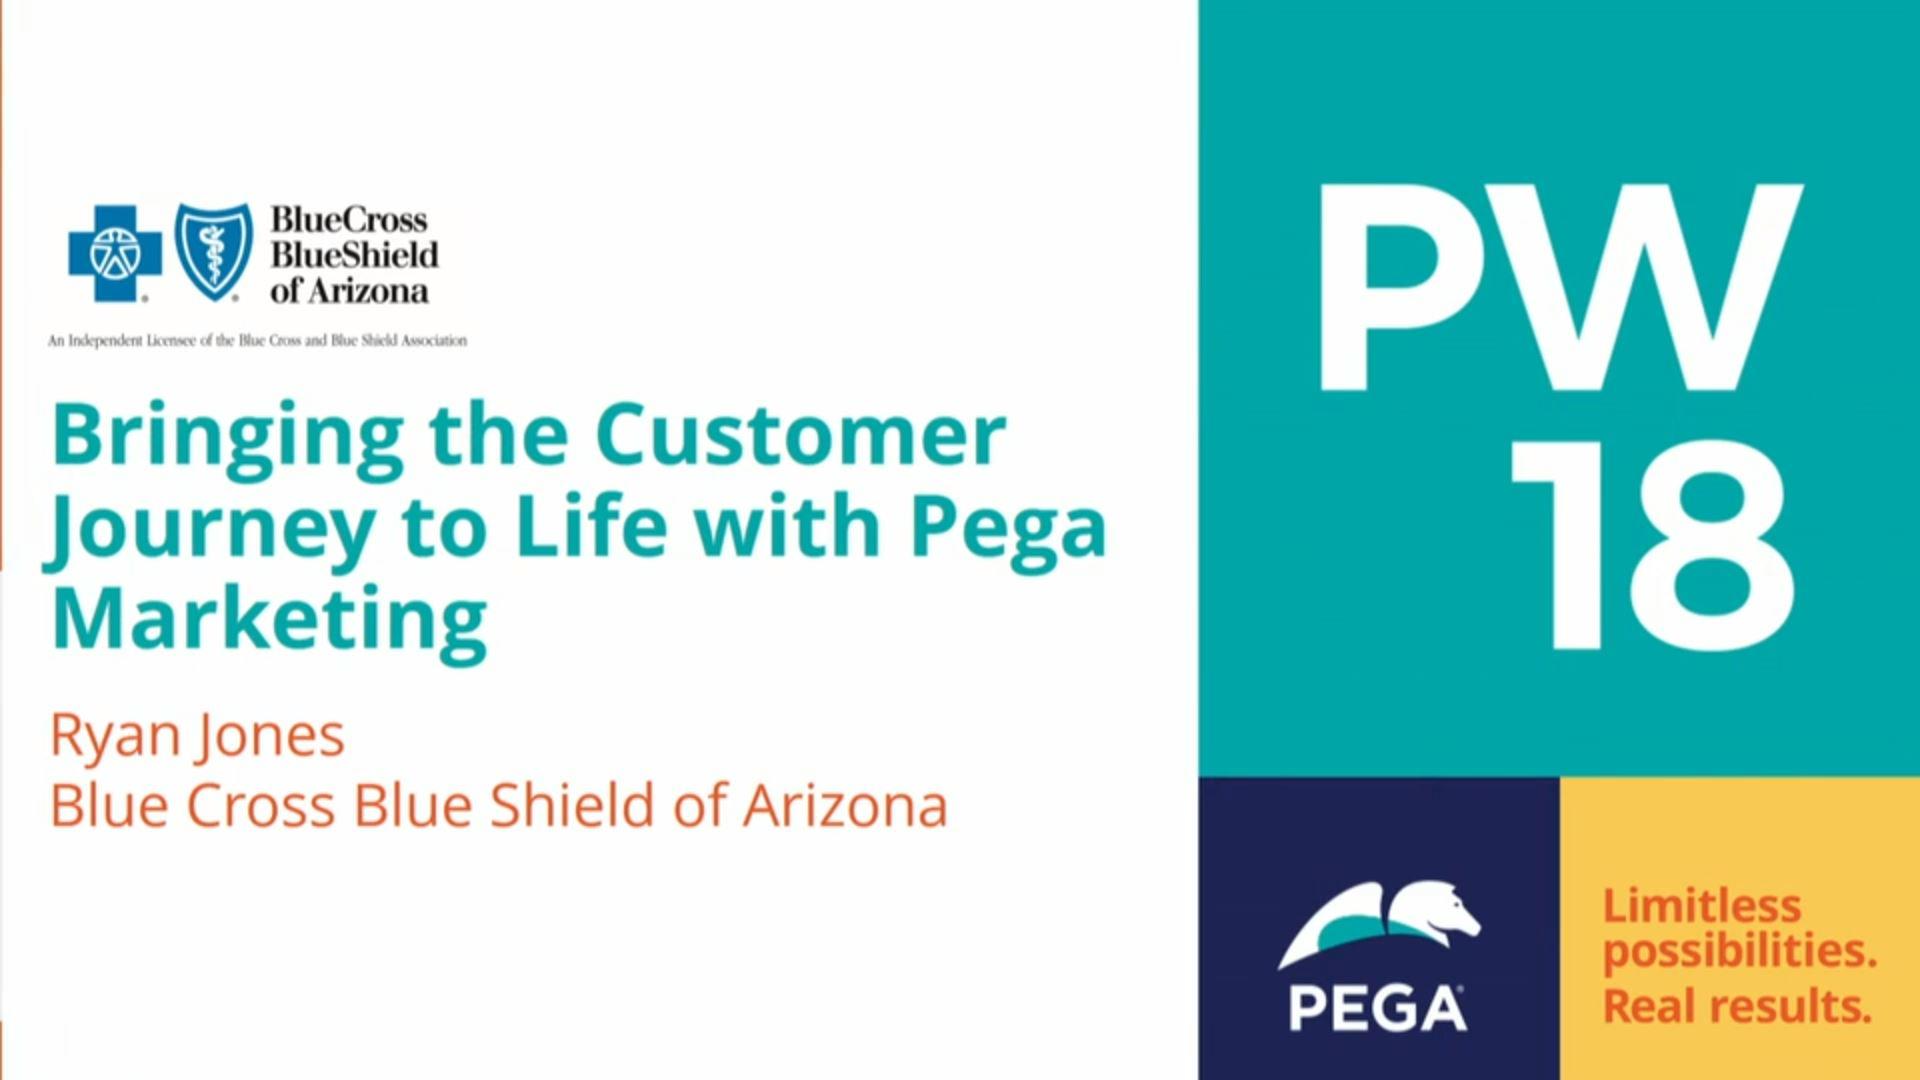 Pegaworld 2018 Bringing The Customer Journey To Life With Pega Marketing At Blue Cross Blue Shield Of Arizona Video Pega